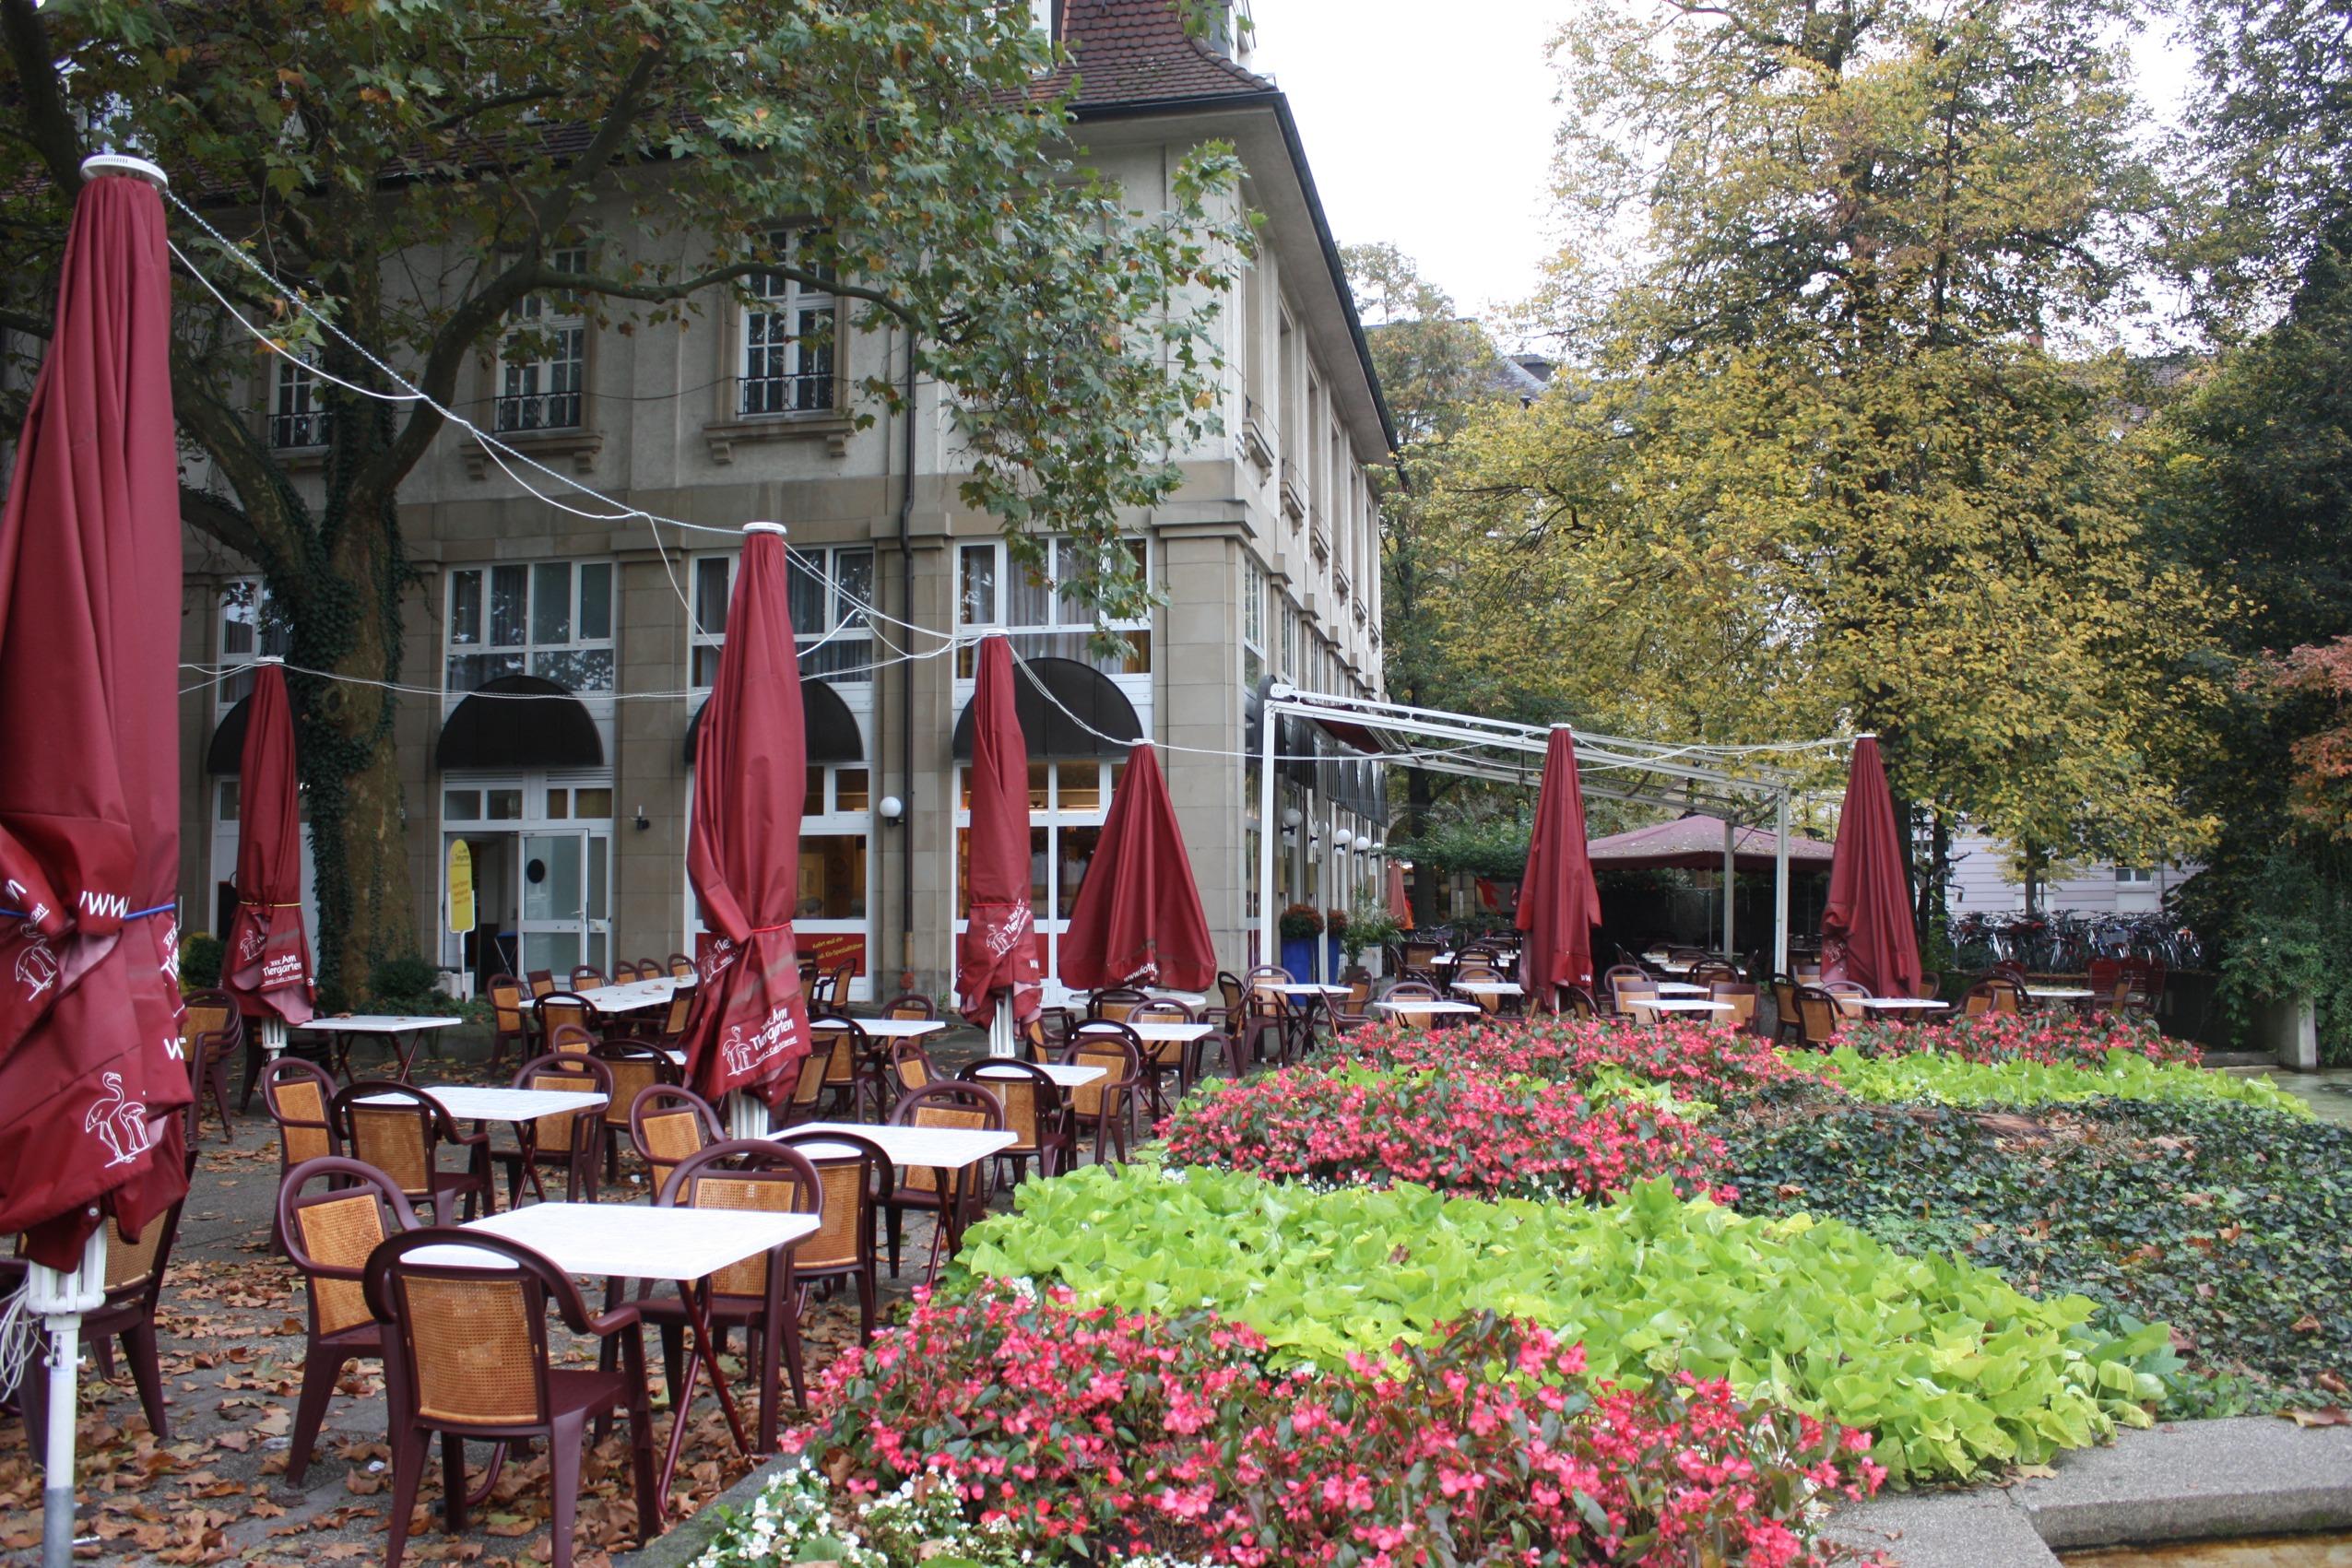 Filekarlsruhe Am Tiergarten Hotel Cafe Restaurant Bild 1jpg